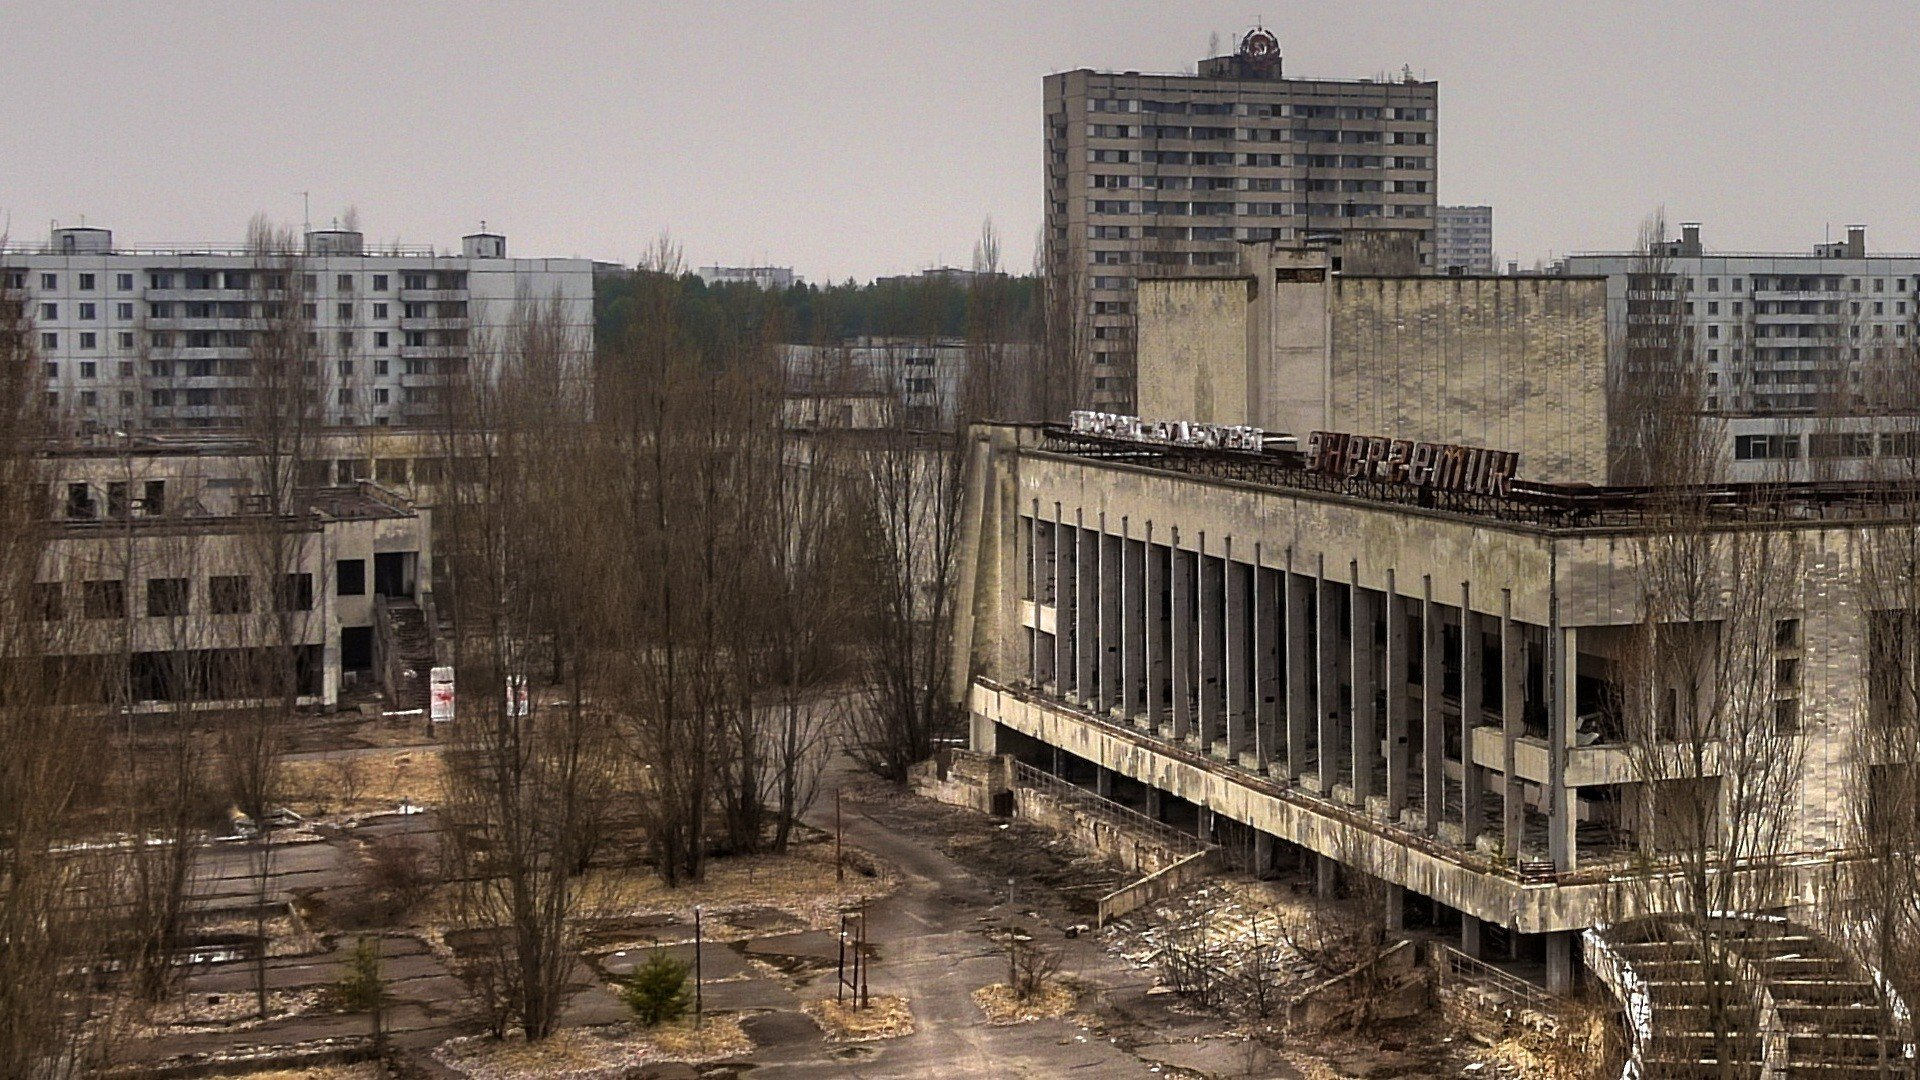 pripyat the ghost town ukraine chernobyl wallpaper   1920x1080